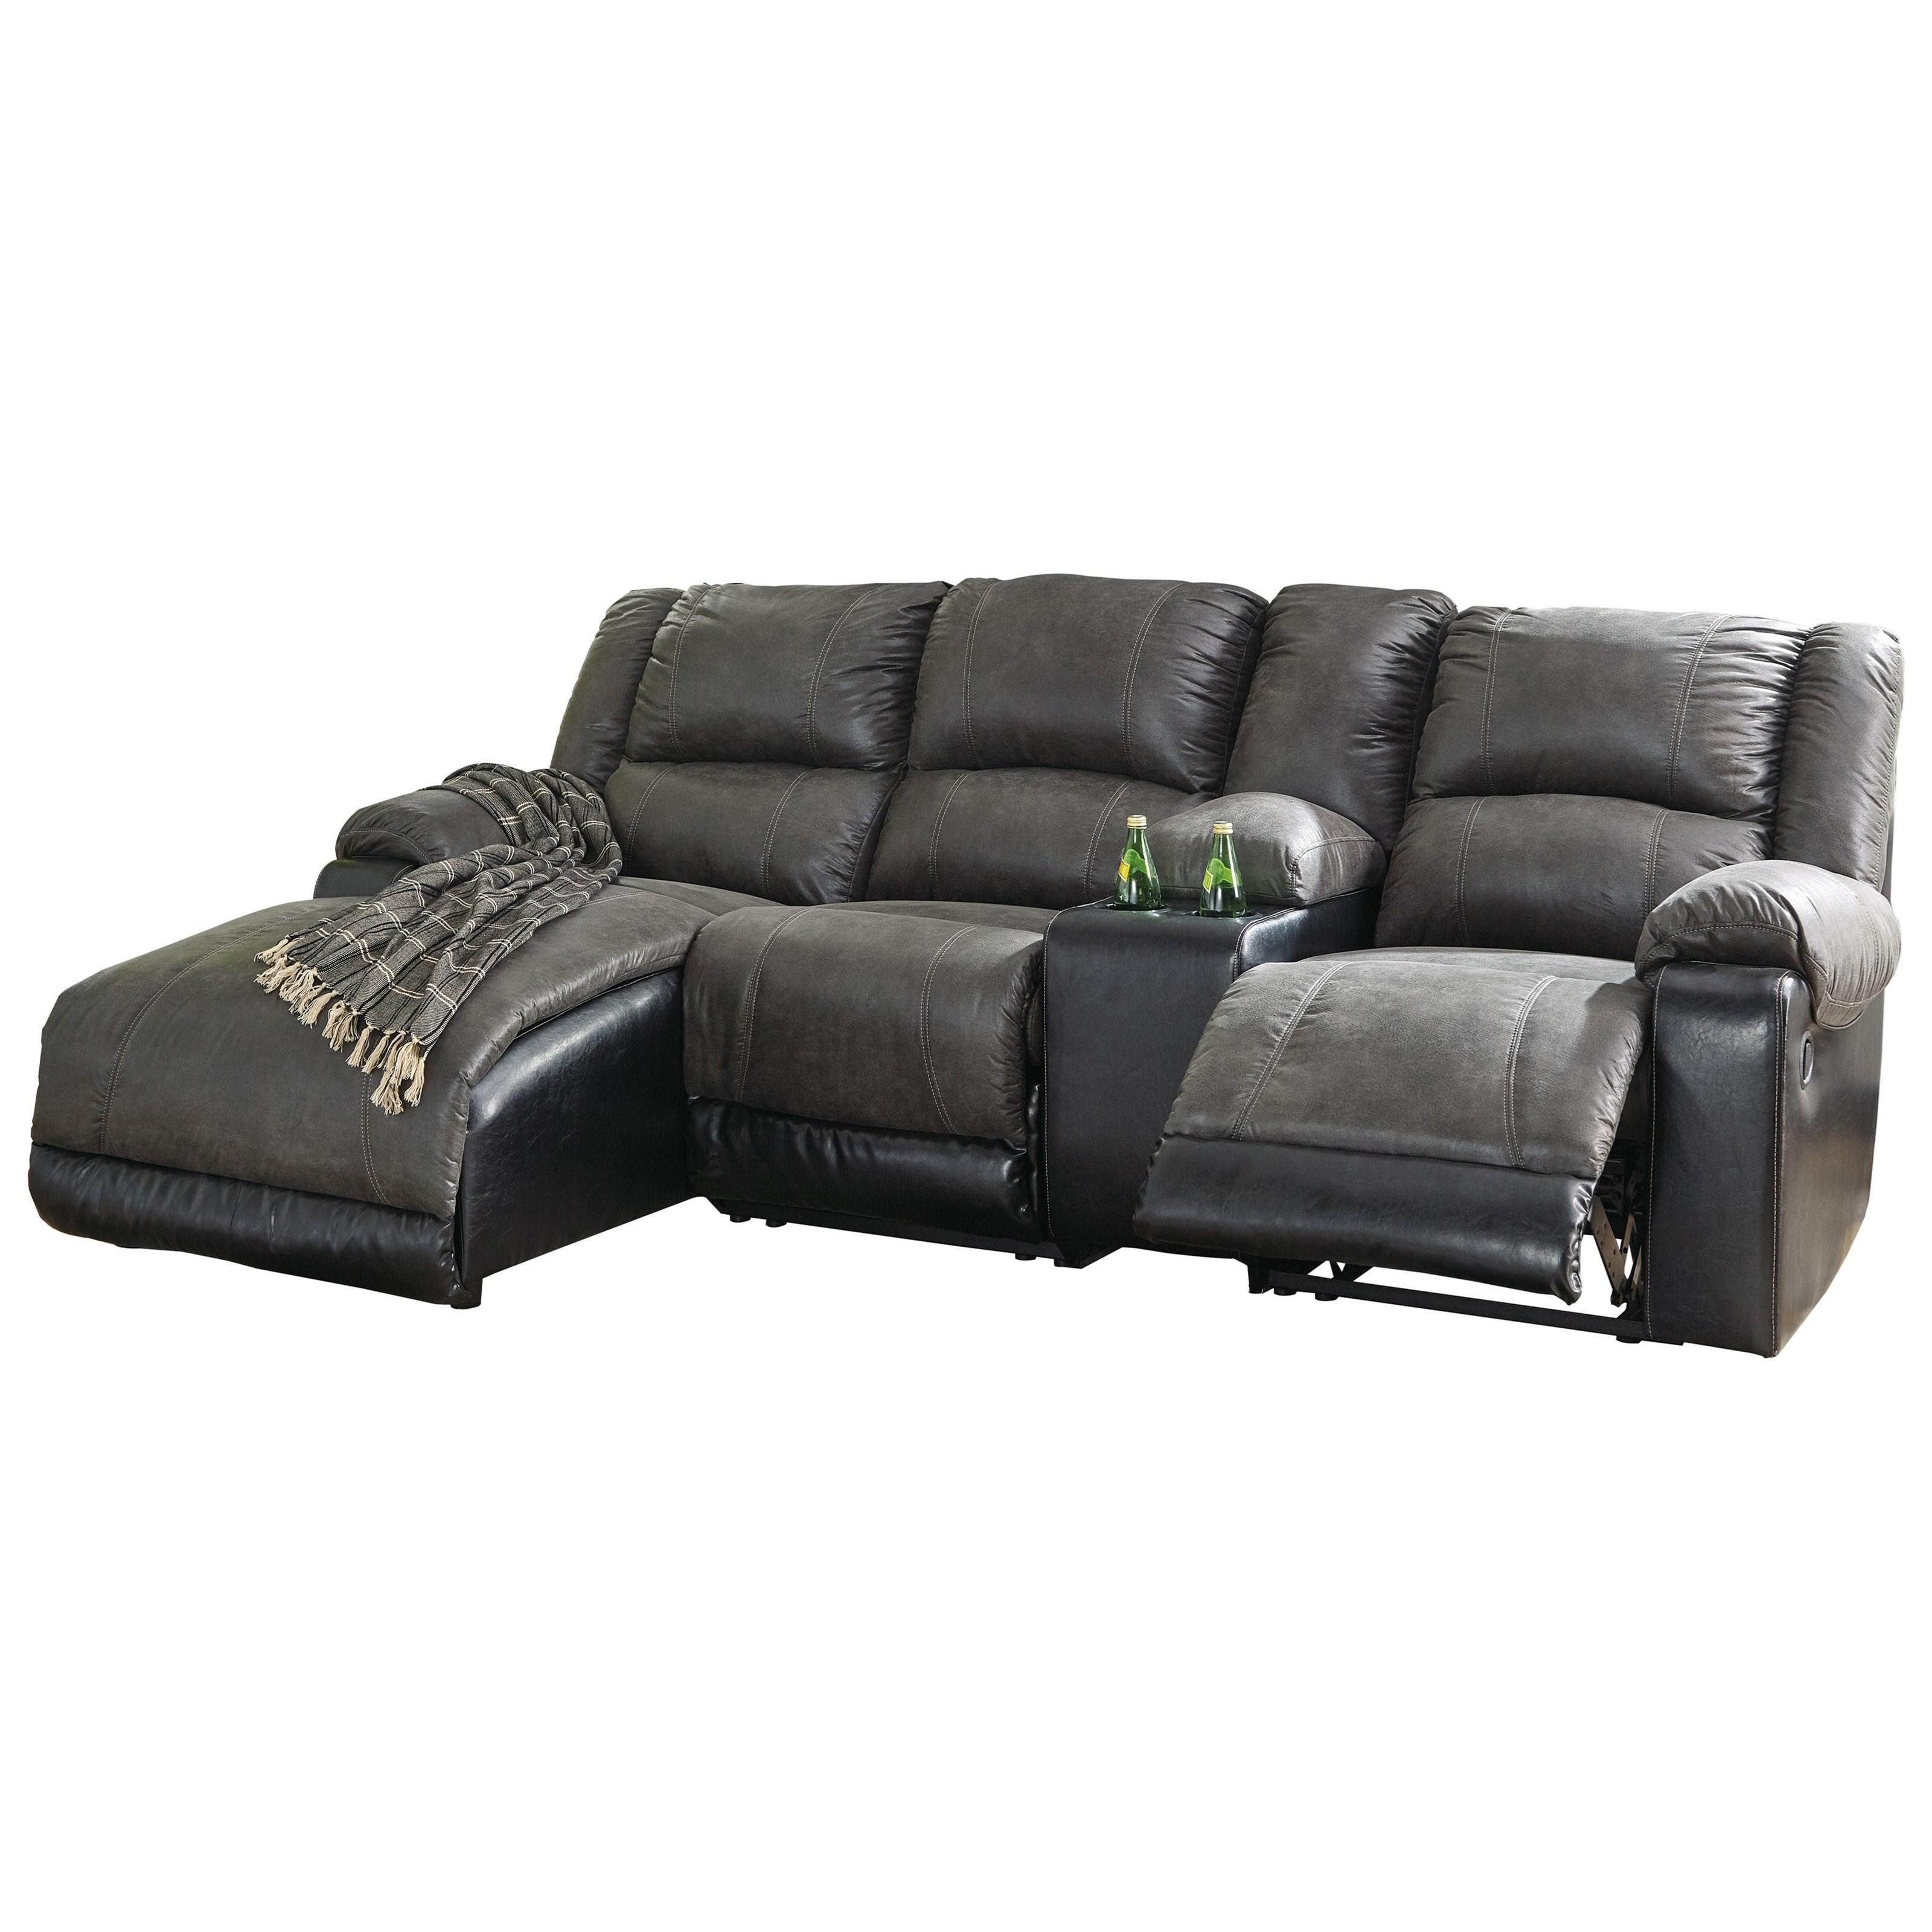 Nantahala Reclining Chaise Sofa by Signature Design by Ashley at Furniture Barn